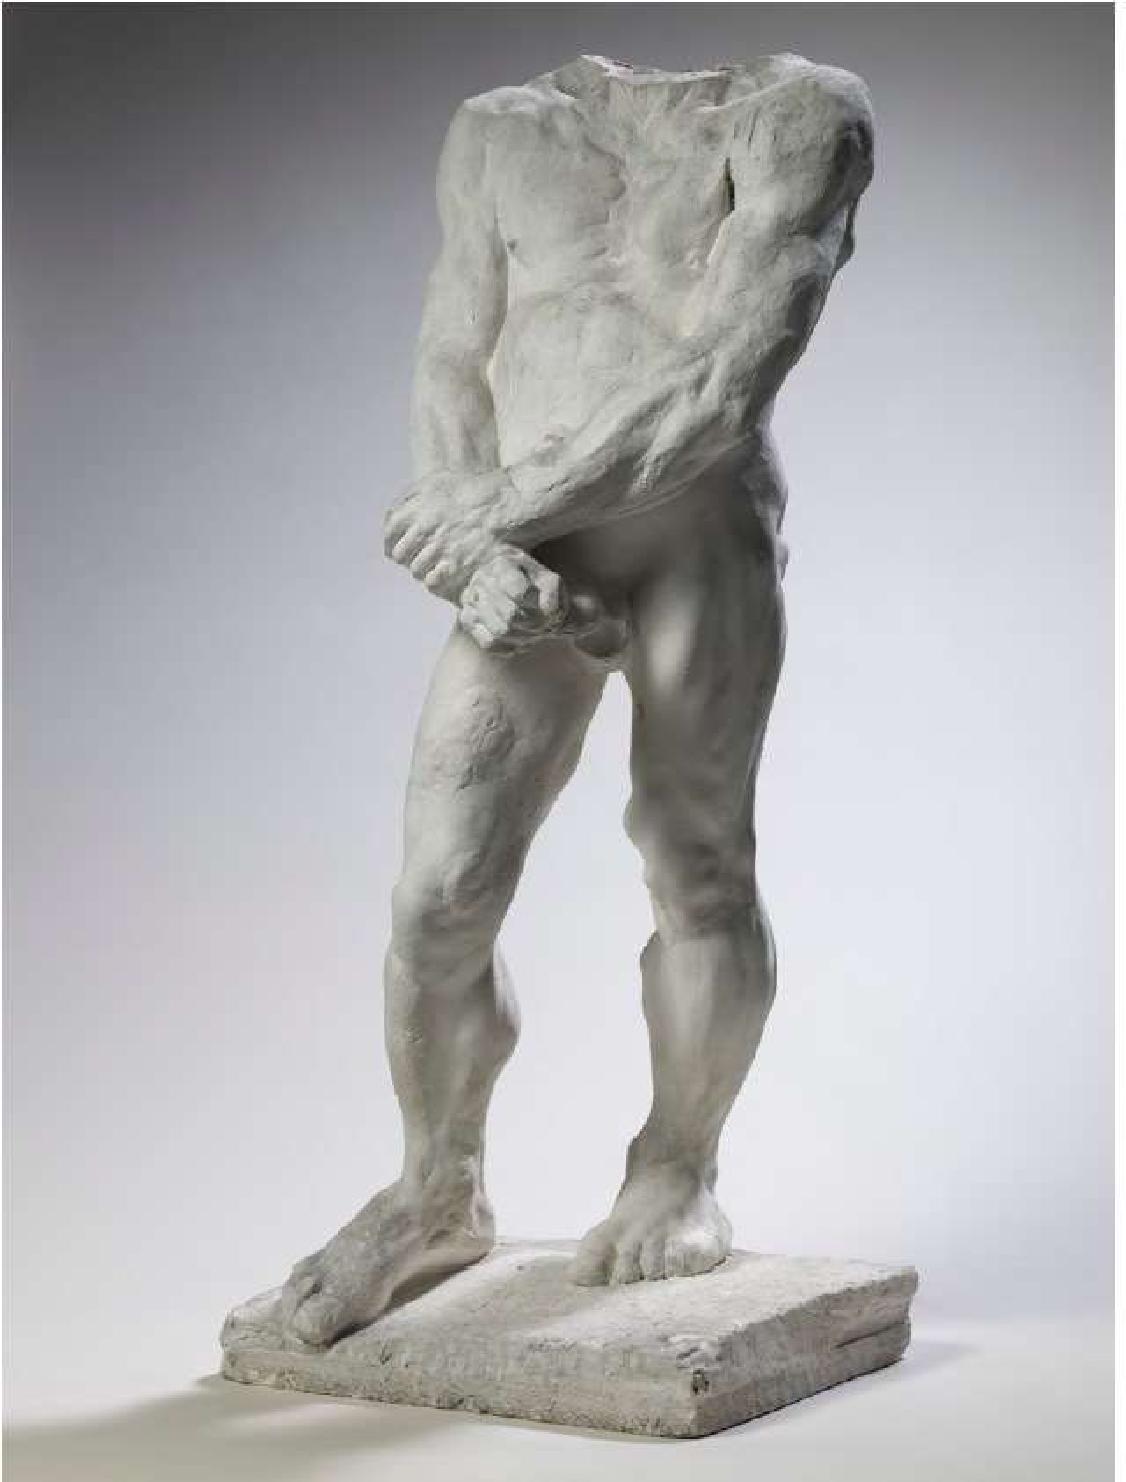 figure 3.28